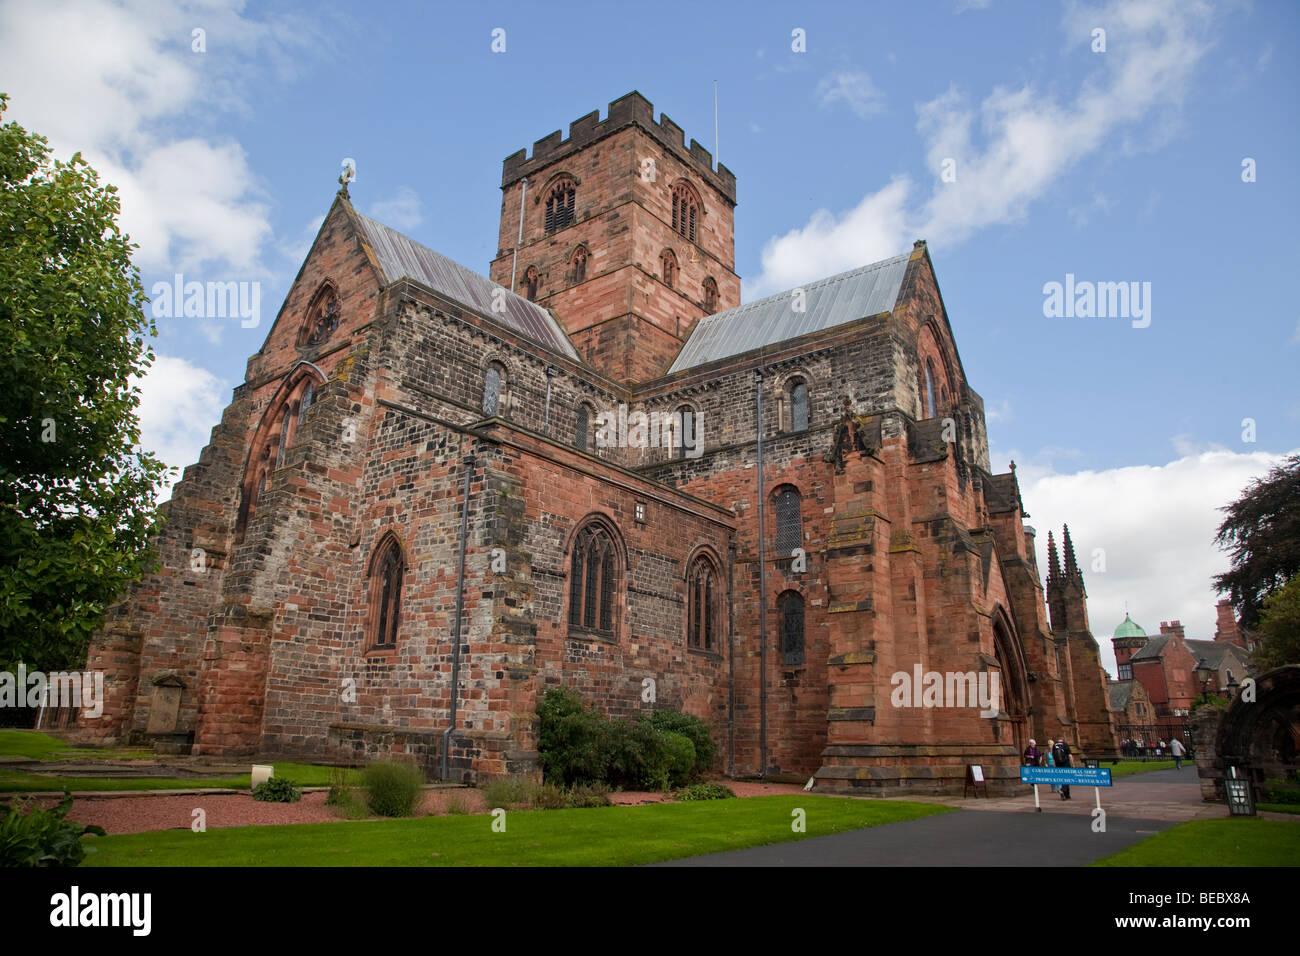 Carlisle Cathedral, Cumbria - Stock Image